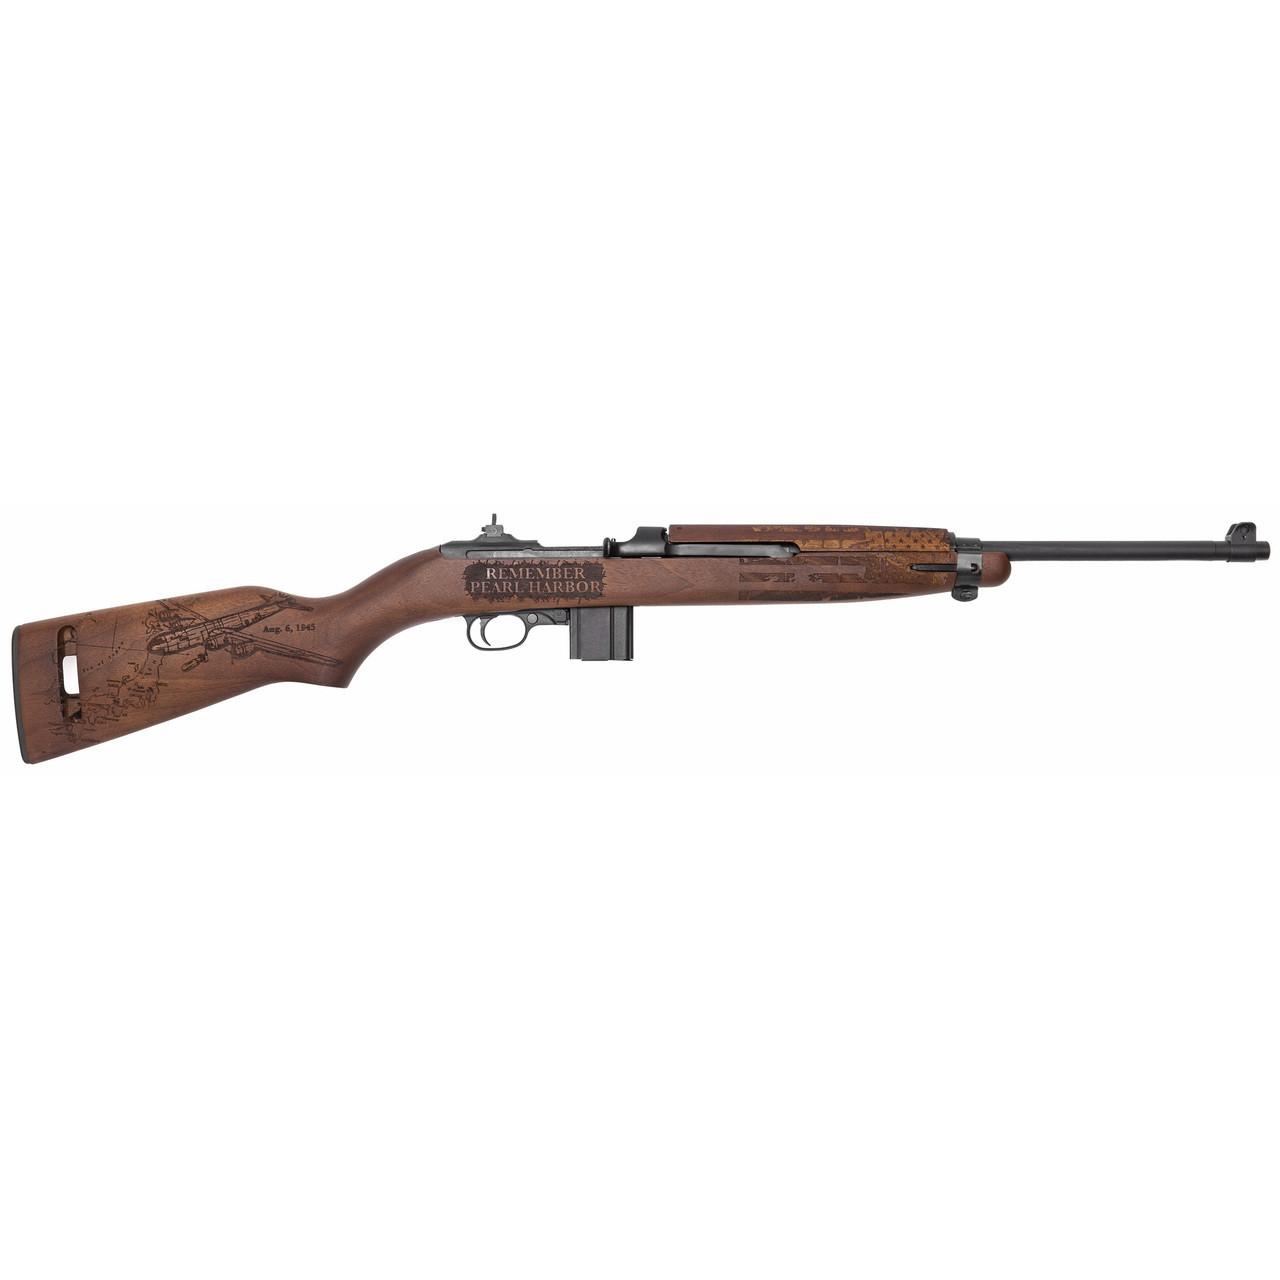 Auto Ordnance WWII Vengeance M1 Carbine CALIFORNIA LEGAL - .30 Carbine